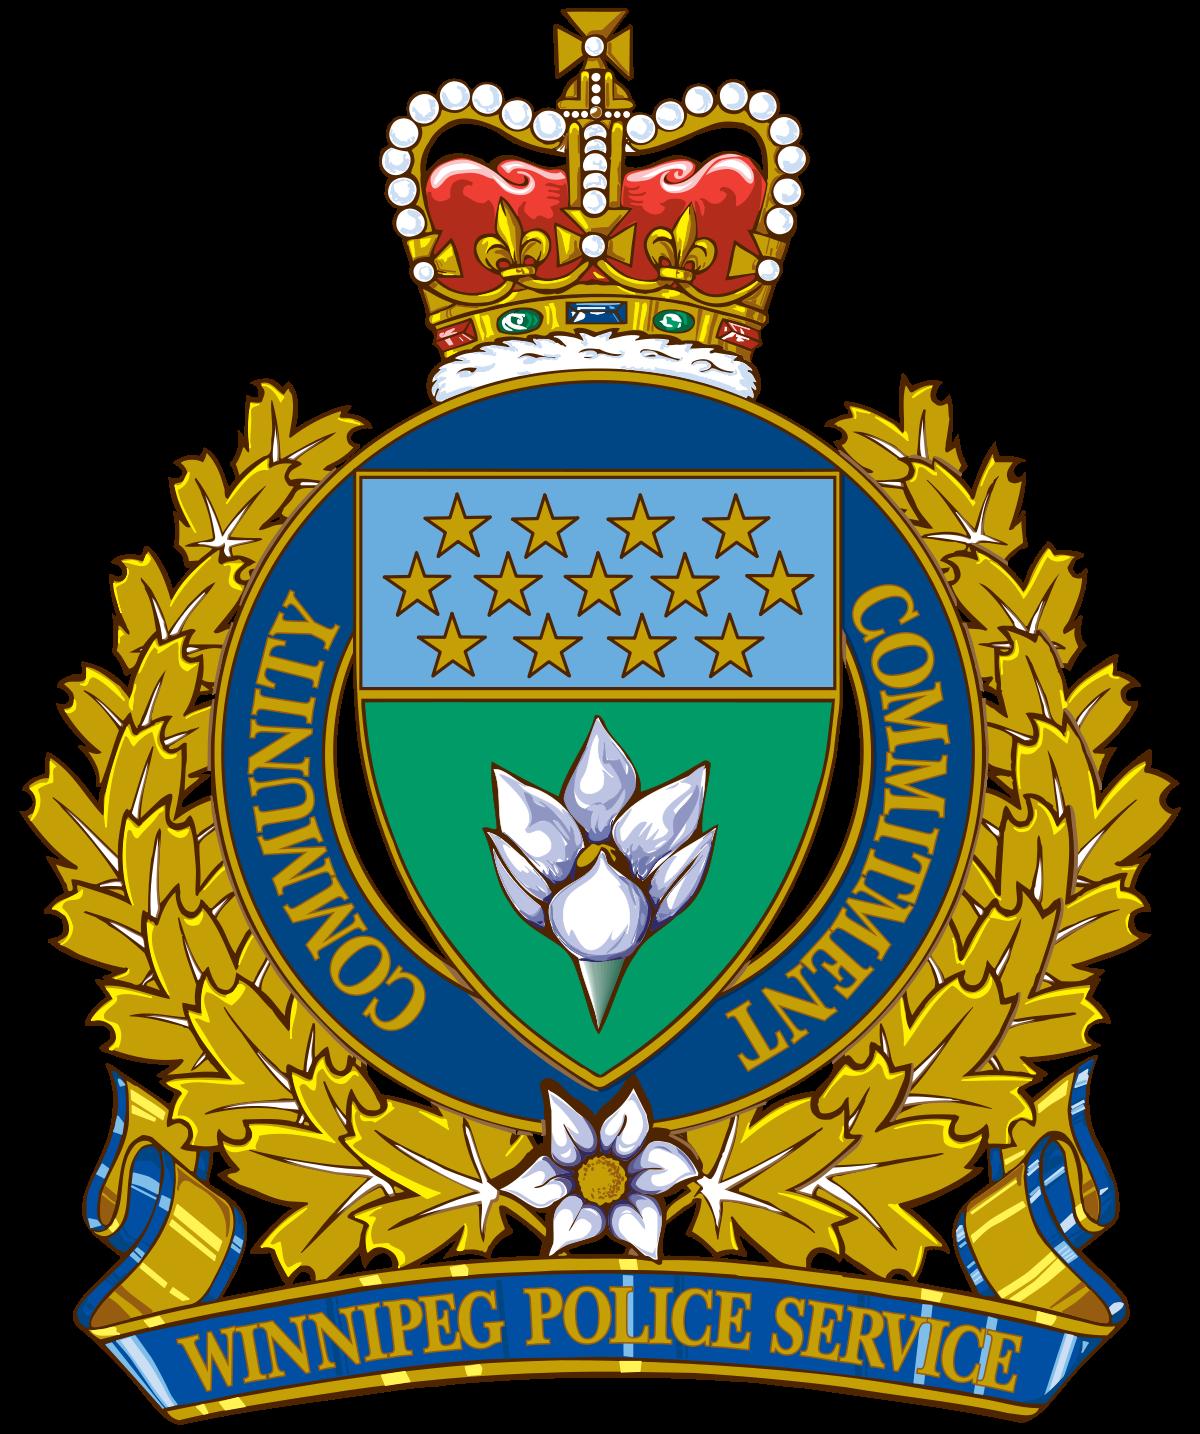 Winnipeg police service wikipedia. Working clipart stress